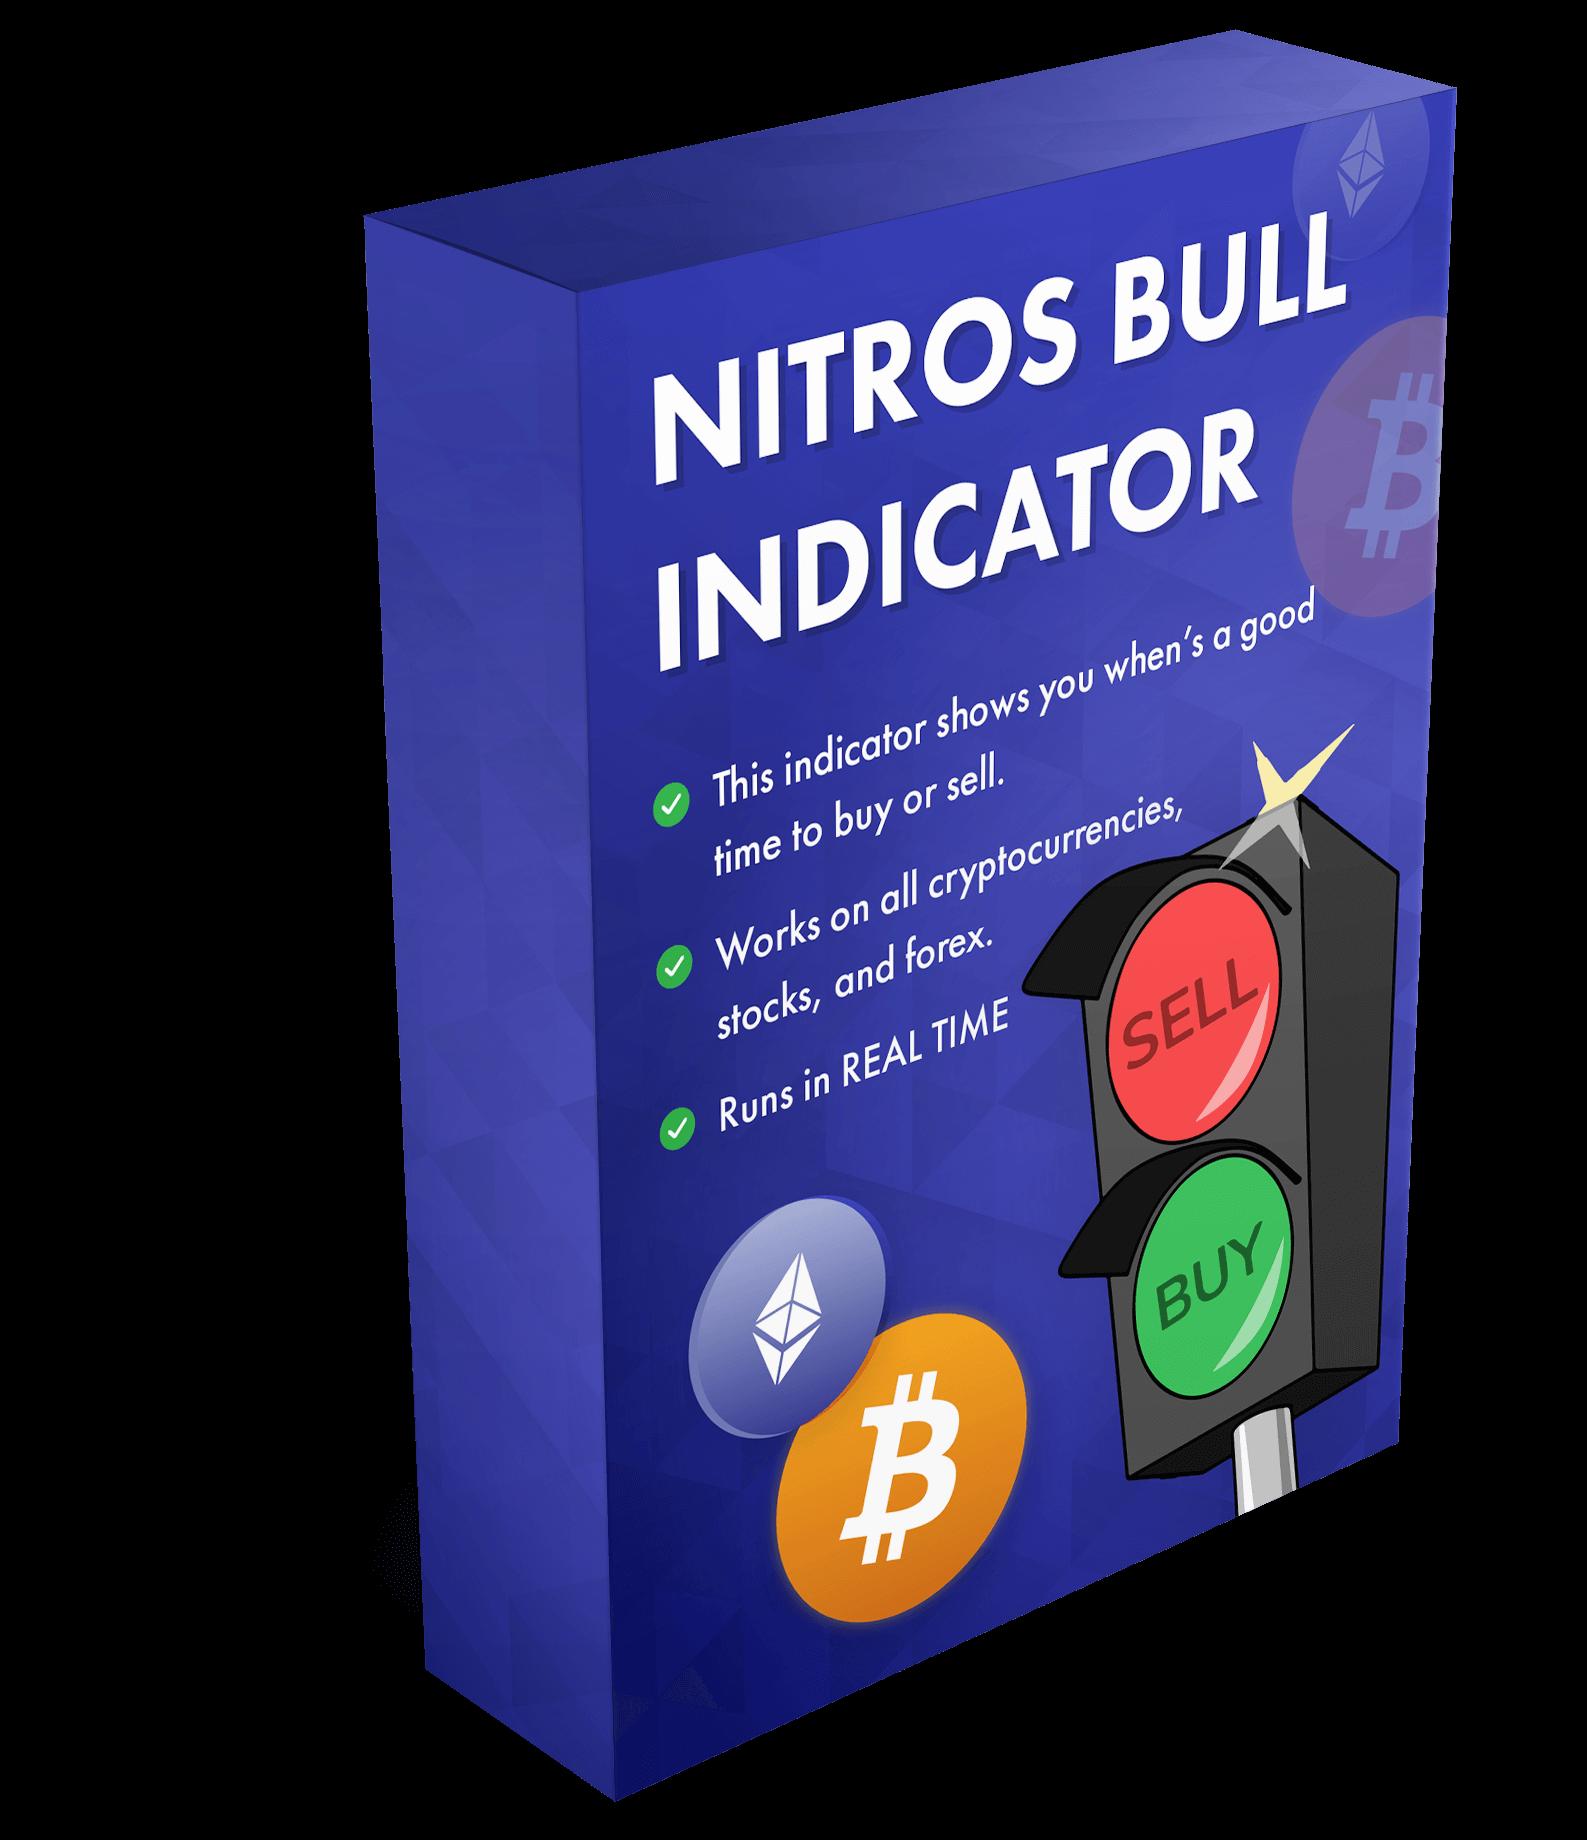 Nitros Bull